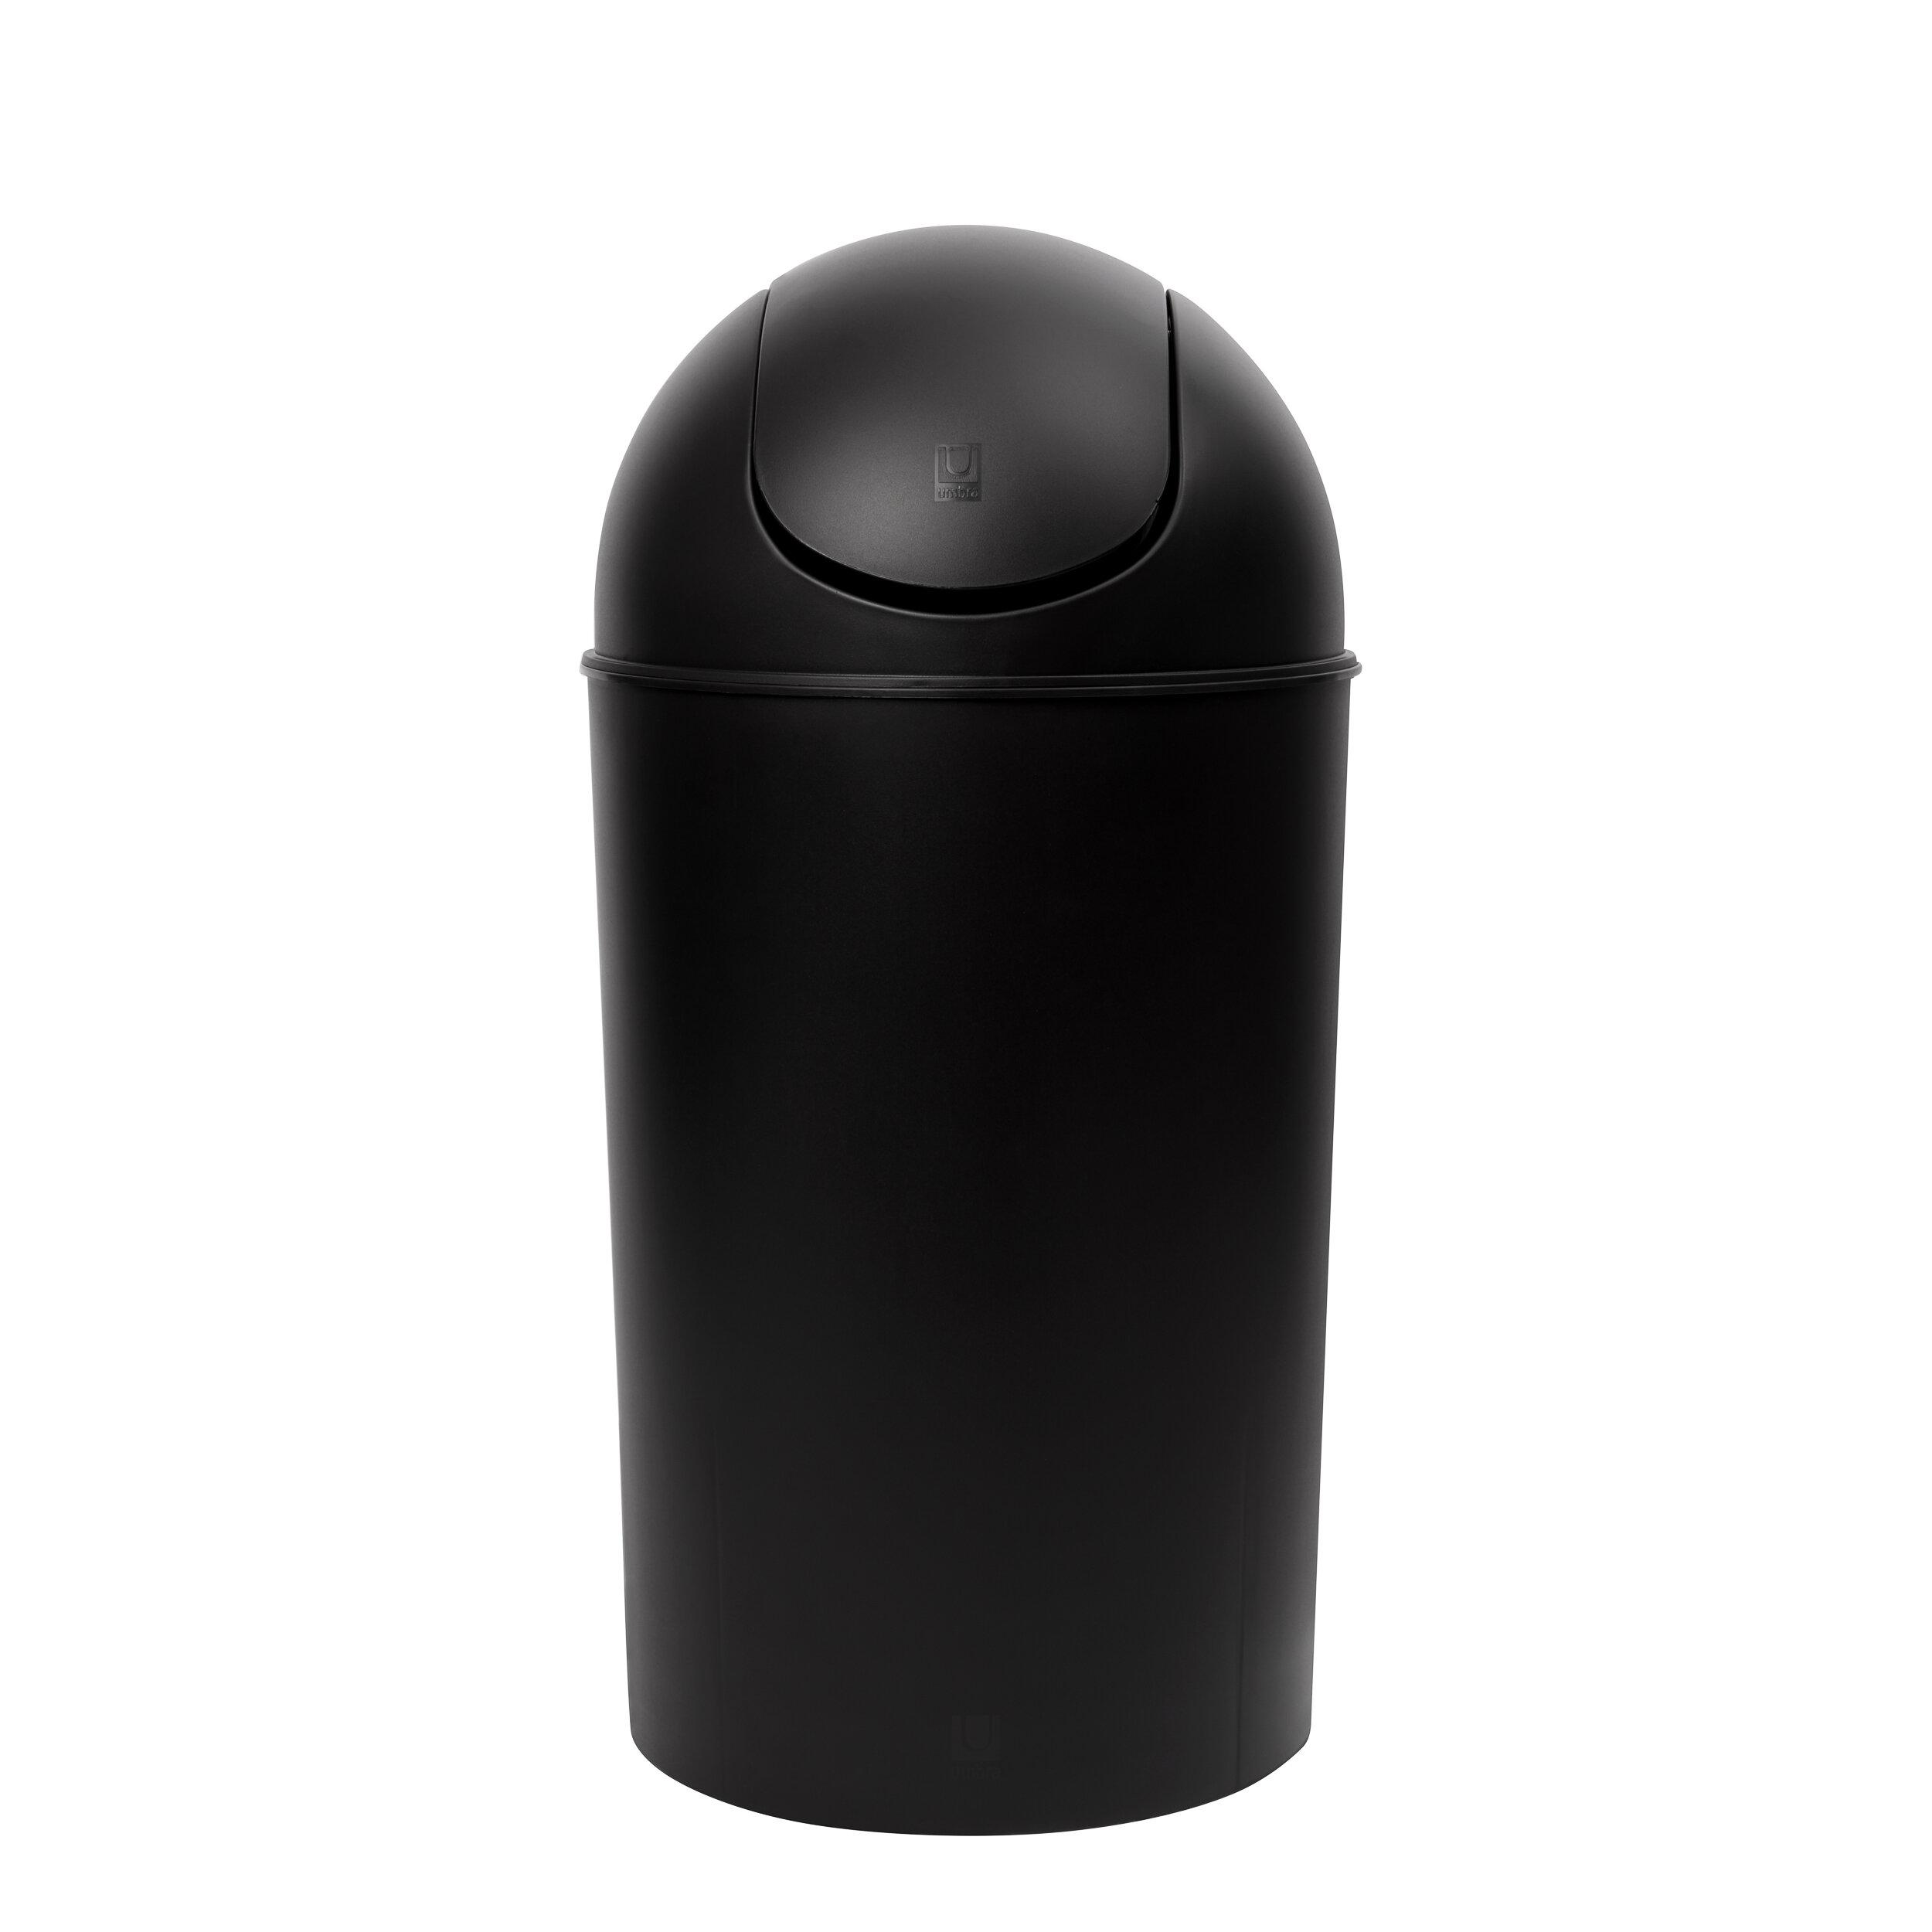 InterDesign 5L Steel Step Can with Bucket Insert for Bathroom Bronze Office Kitchen